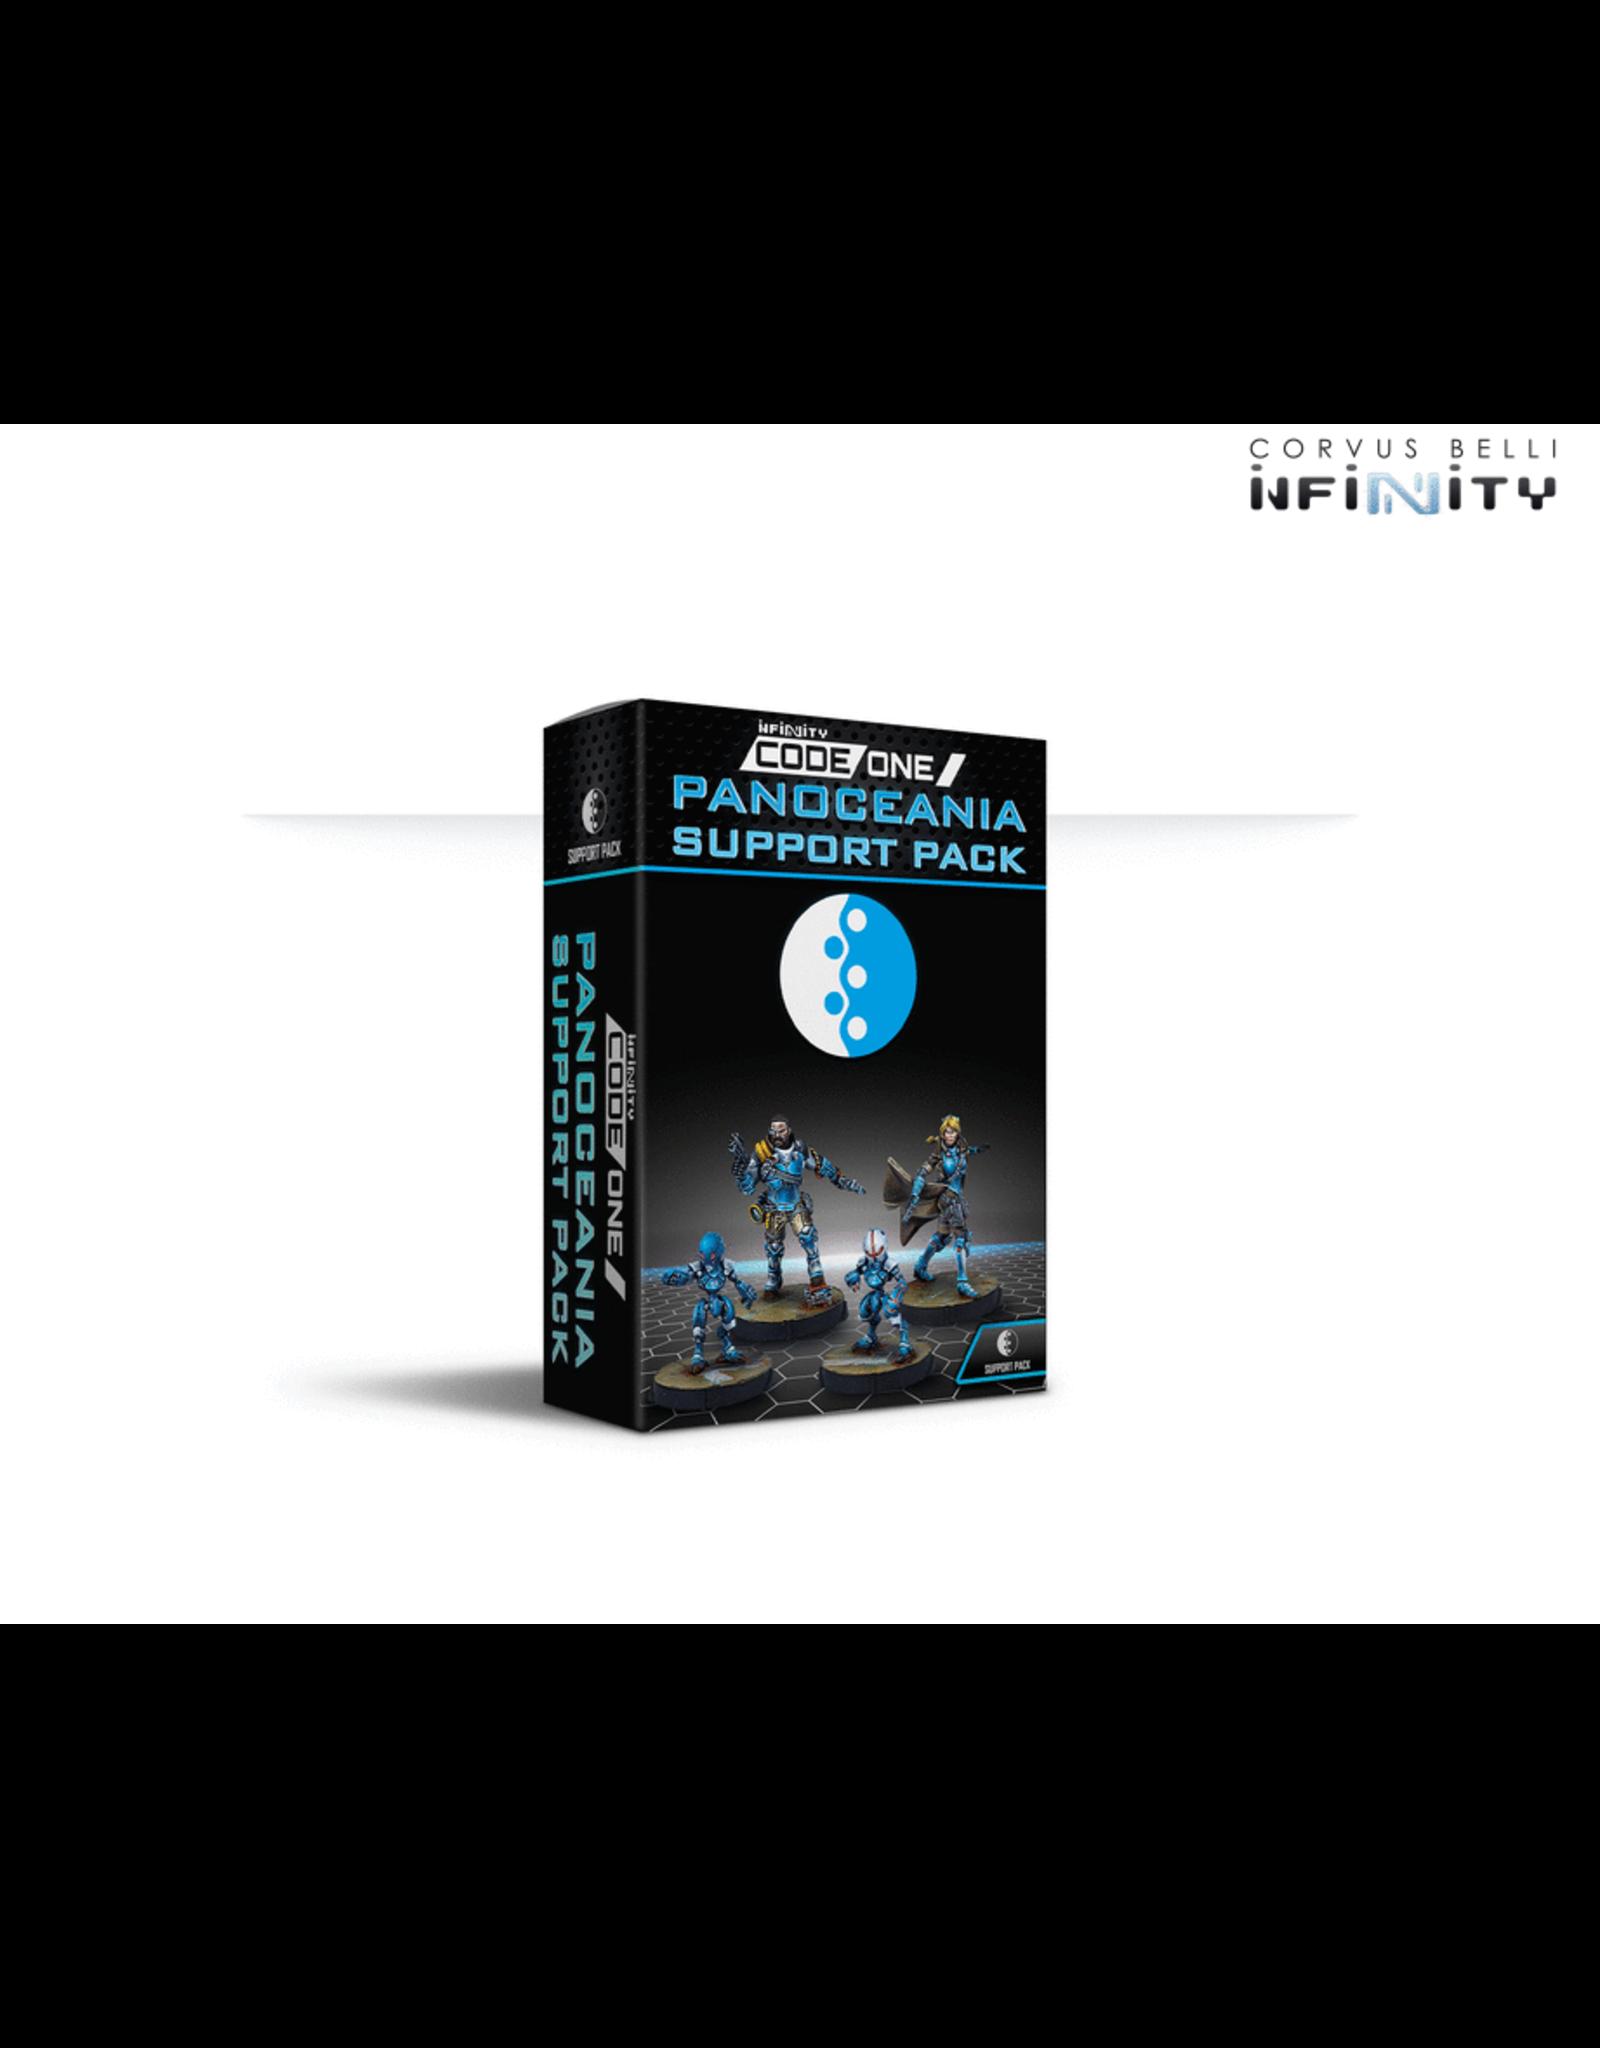 Corvus Belli Infinity: PanOceania Support Pack